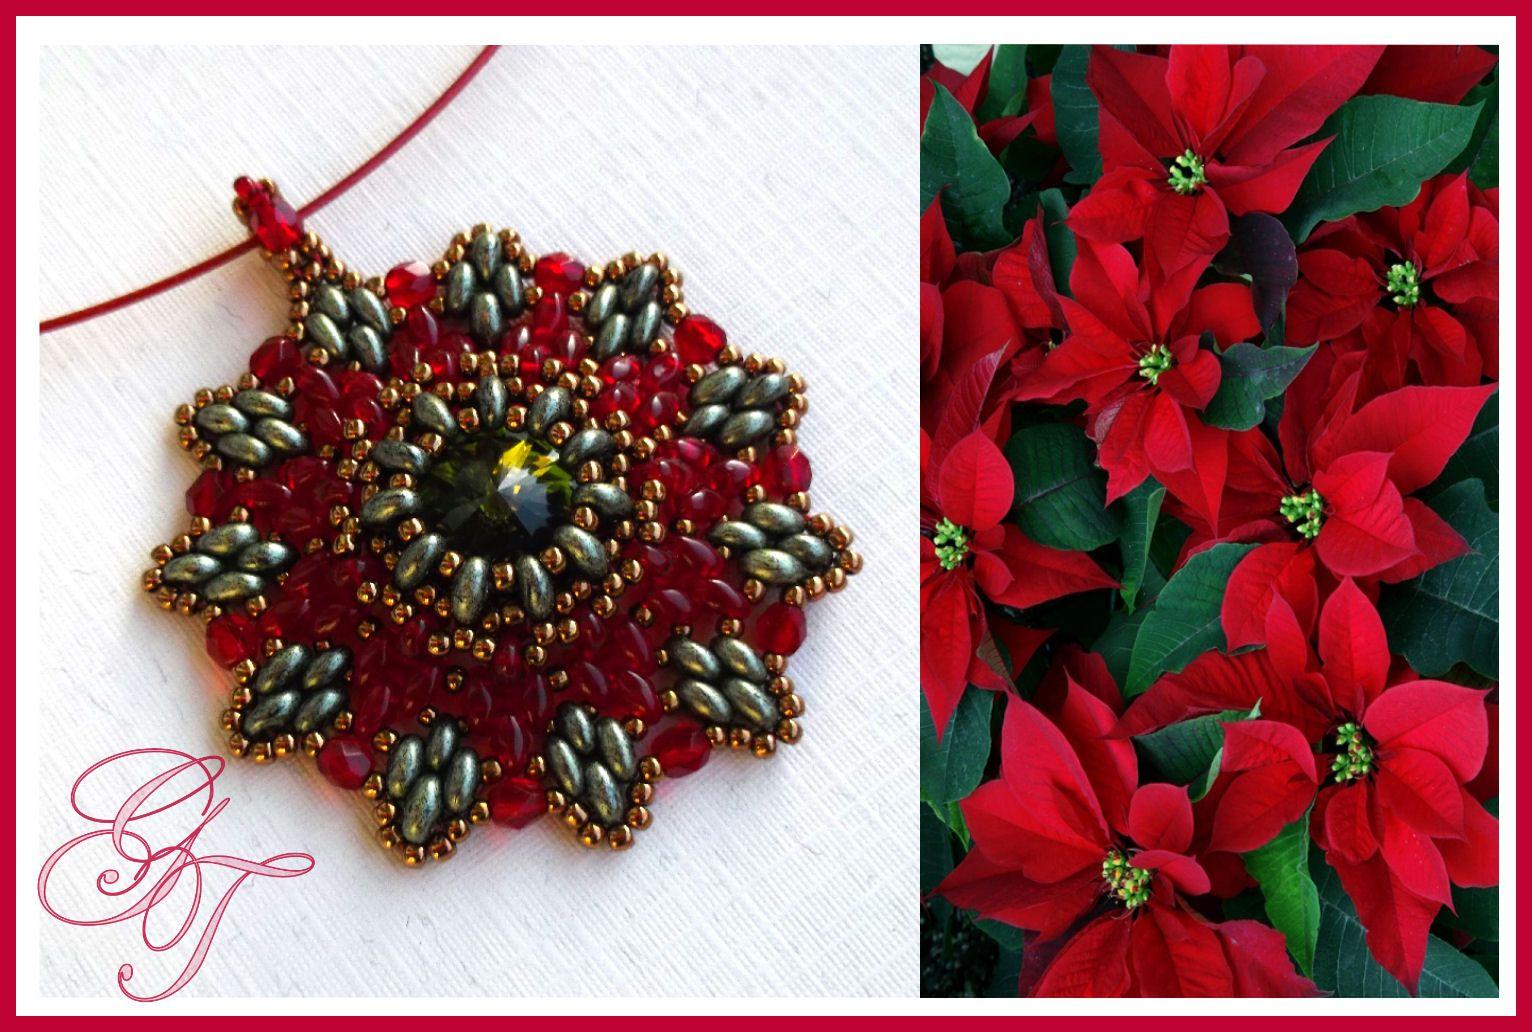 Адвент- календарь. Пуансеттия. | biser.info - всё о бисере и бисерном творчестве